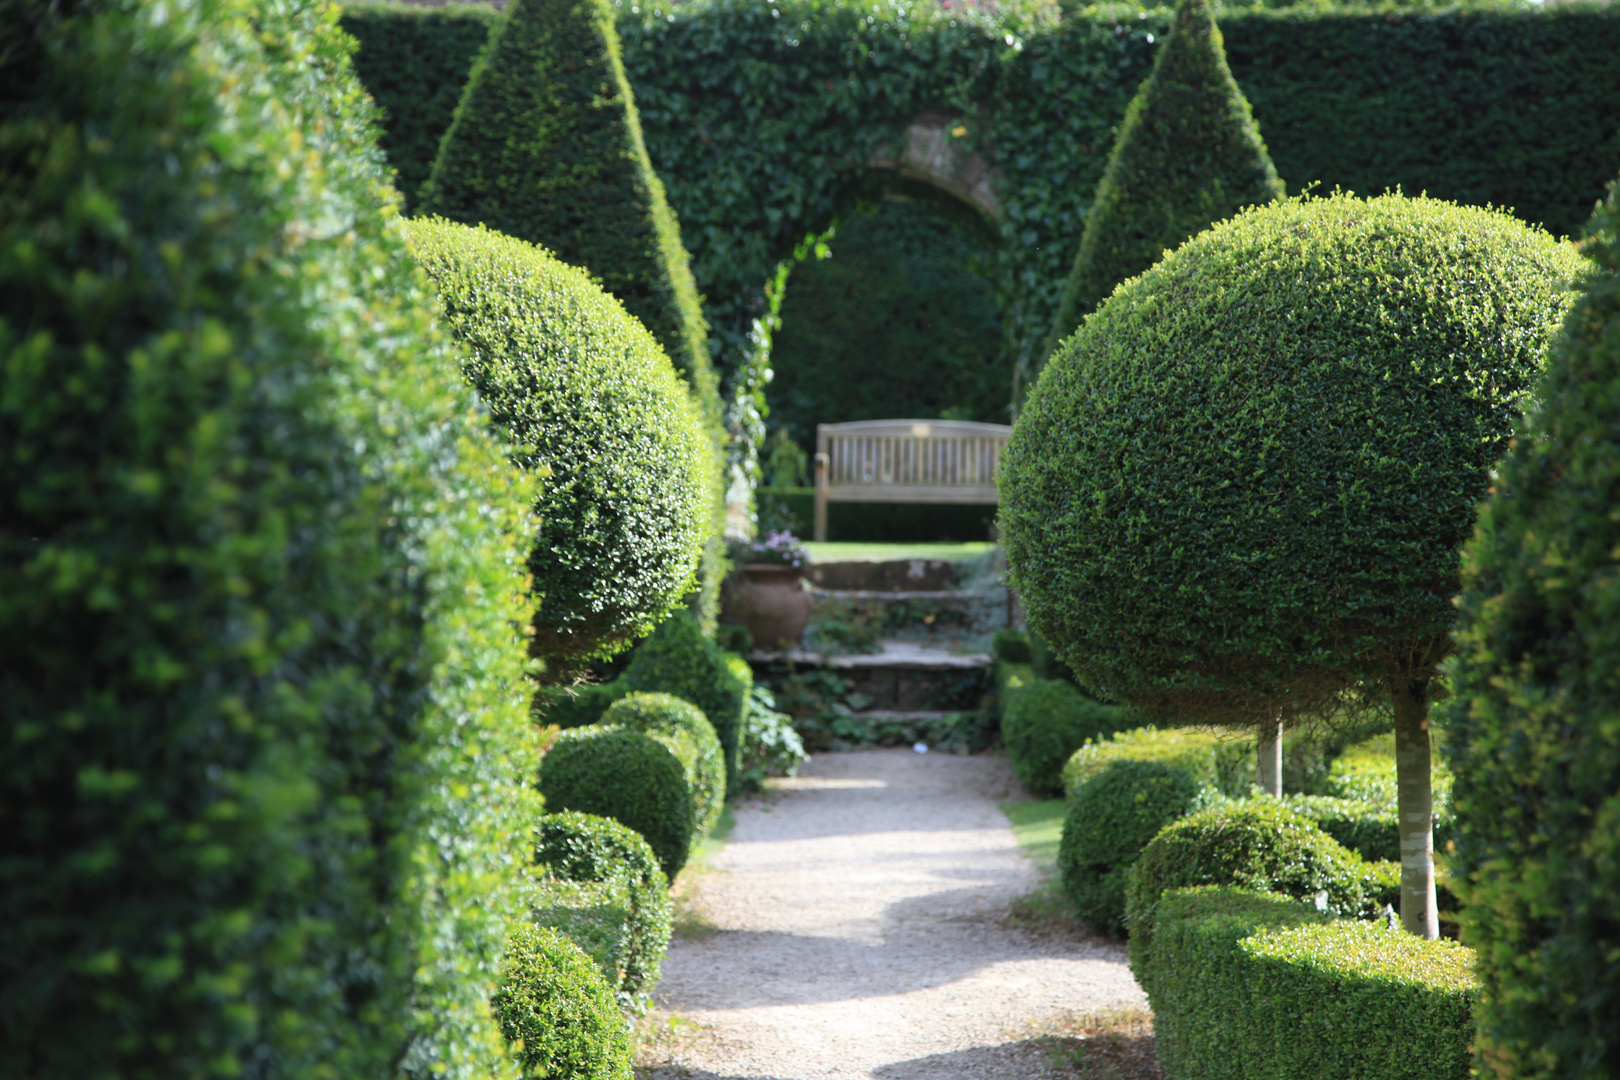 Abbey House Gardens in Malmesbury